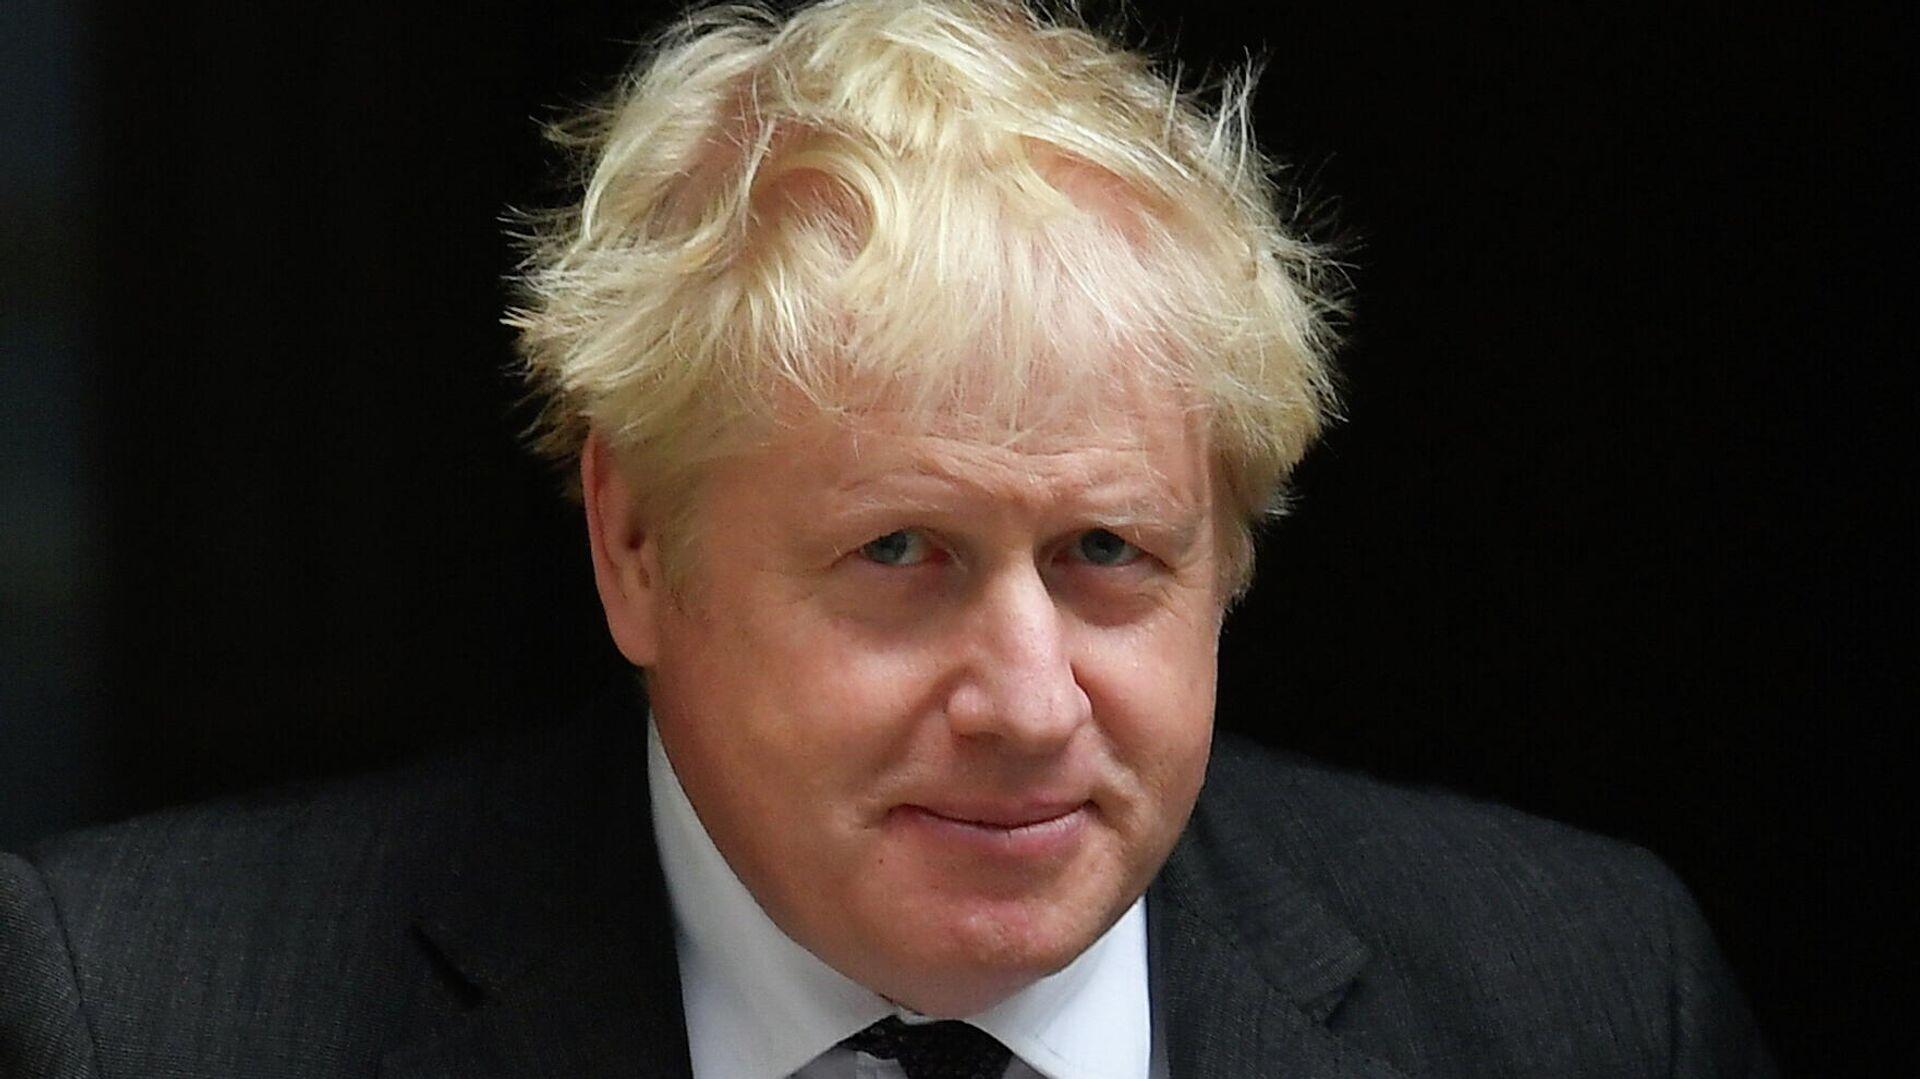 Britain's PM Johnson walks outside Downing Street in London - Sputnik International, 1920, 15.09.2021